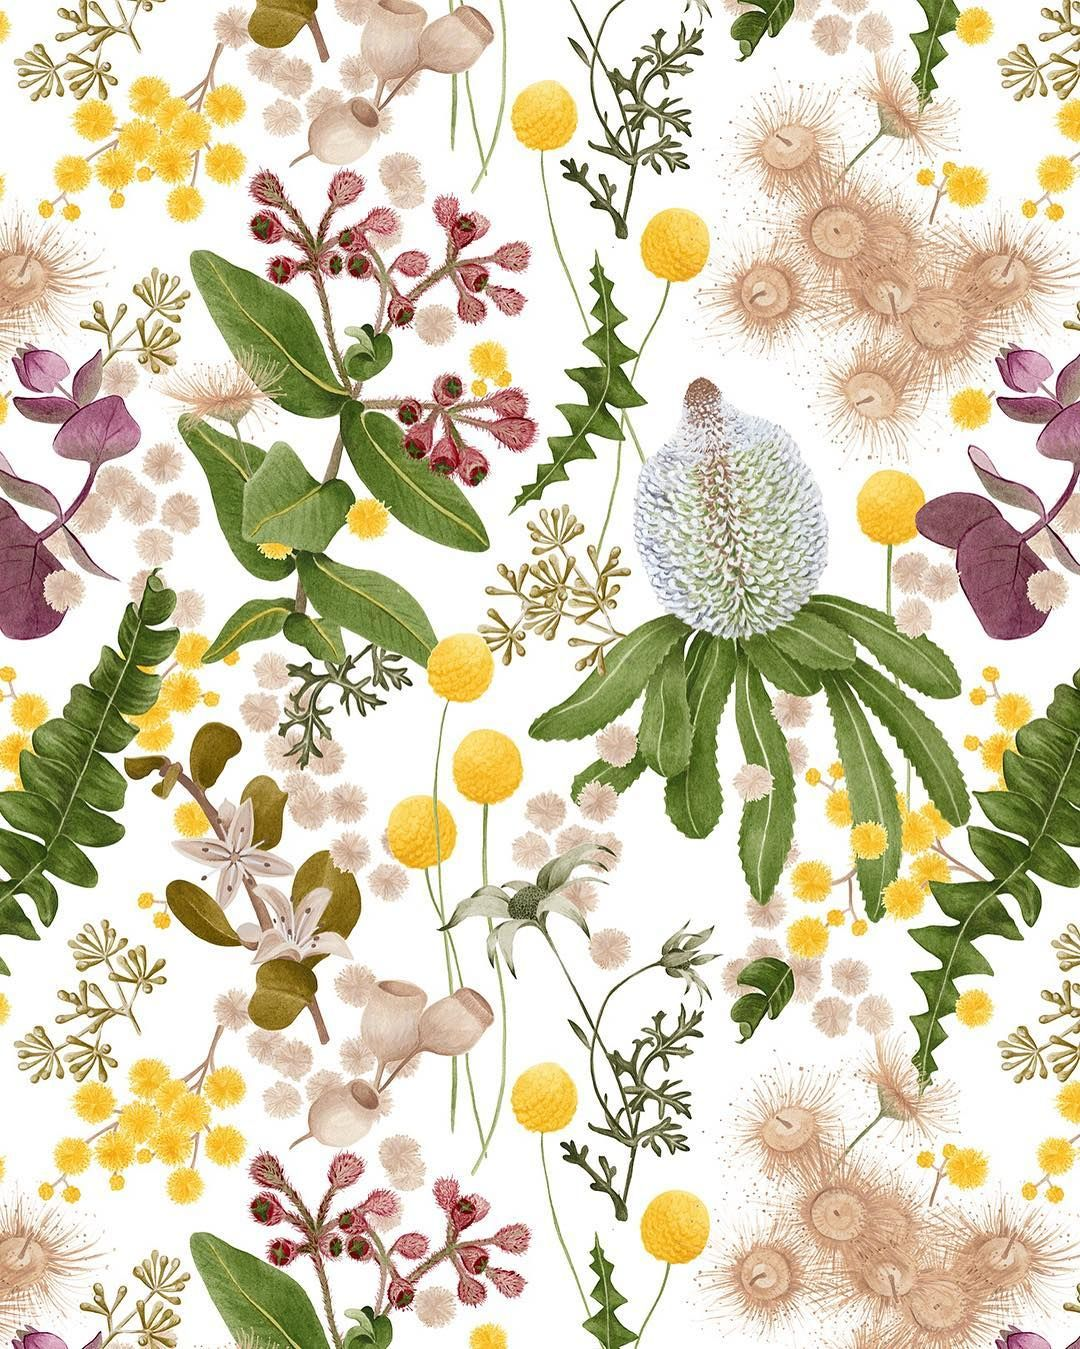 Botanical wallpaper for @haymespaint Colour Library Vol 3.